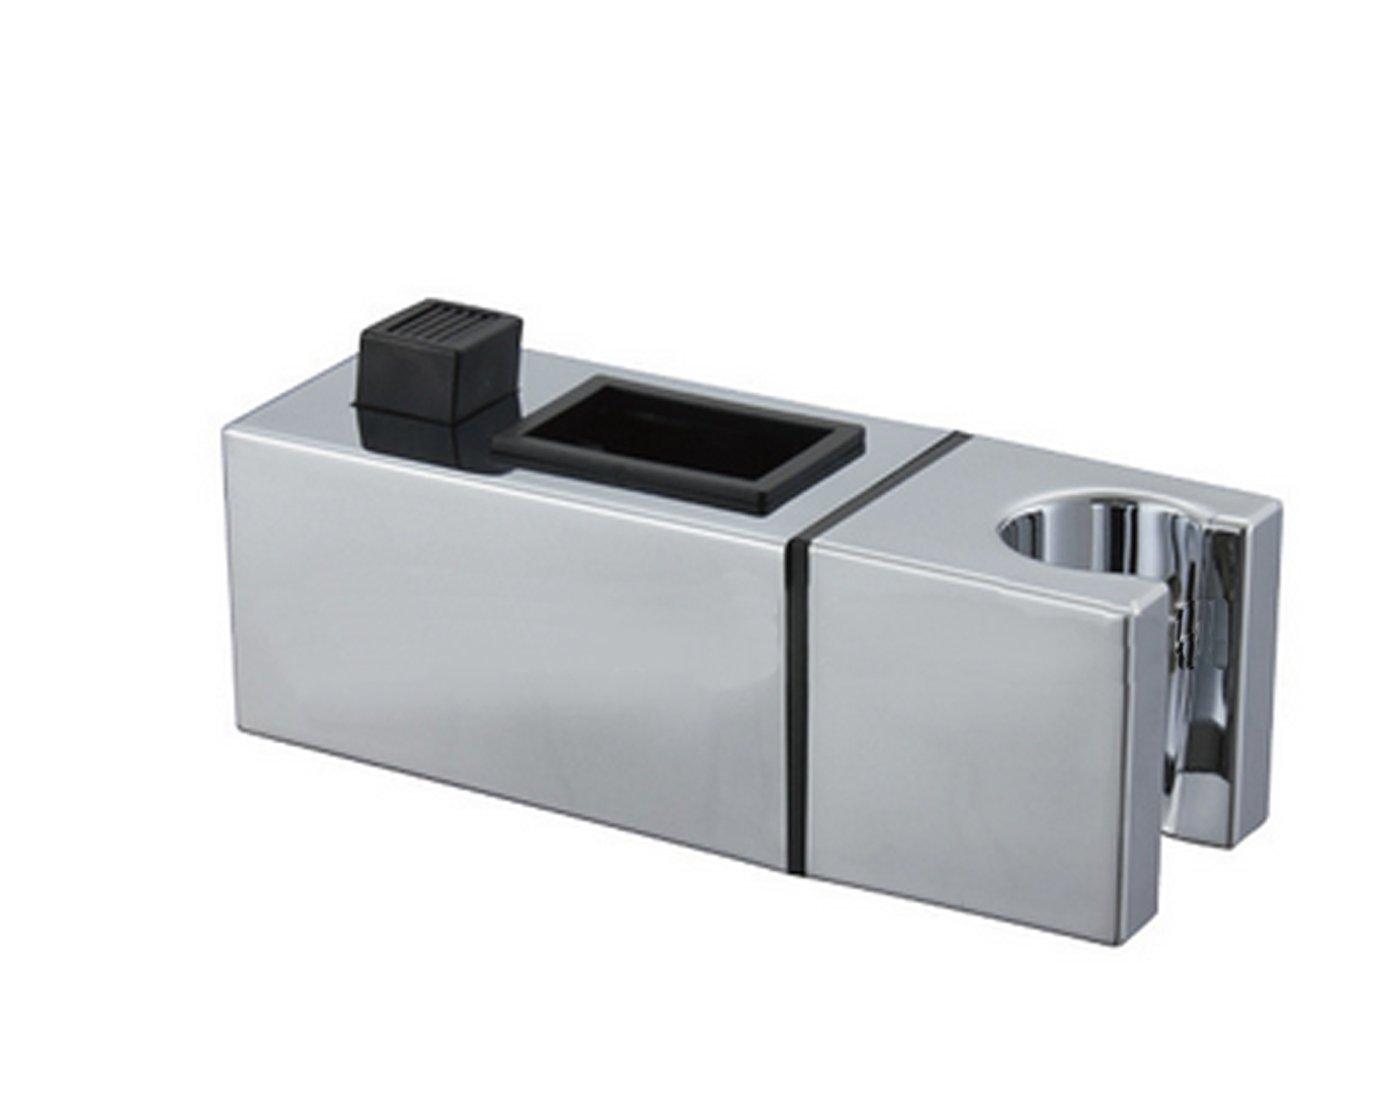 /ABS Chrom/é pour douchette yiyida T/ête de douche Support douchette Support pour barre Place Lubrifiant standard 22/x 22/mm/